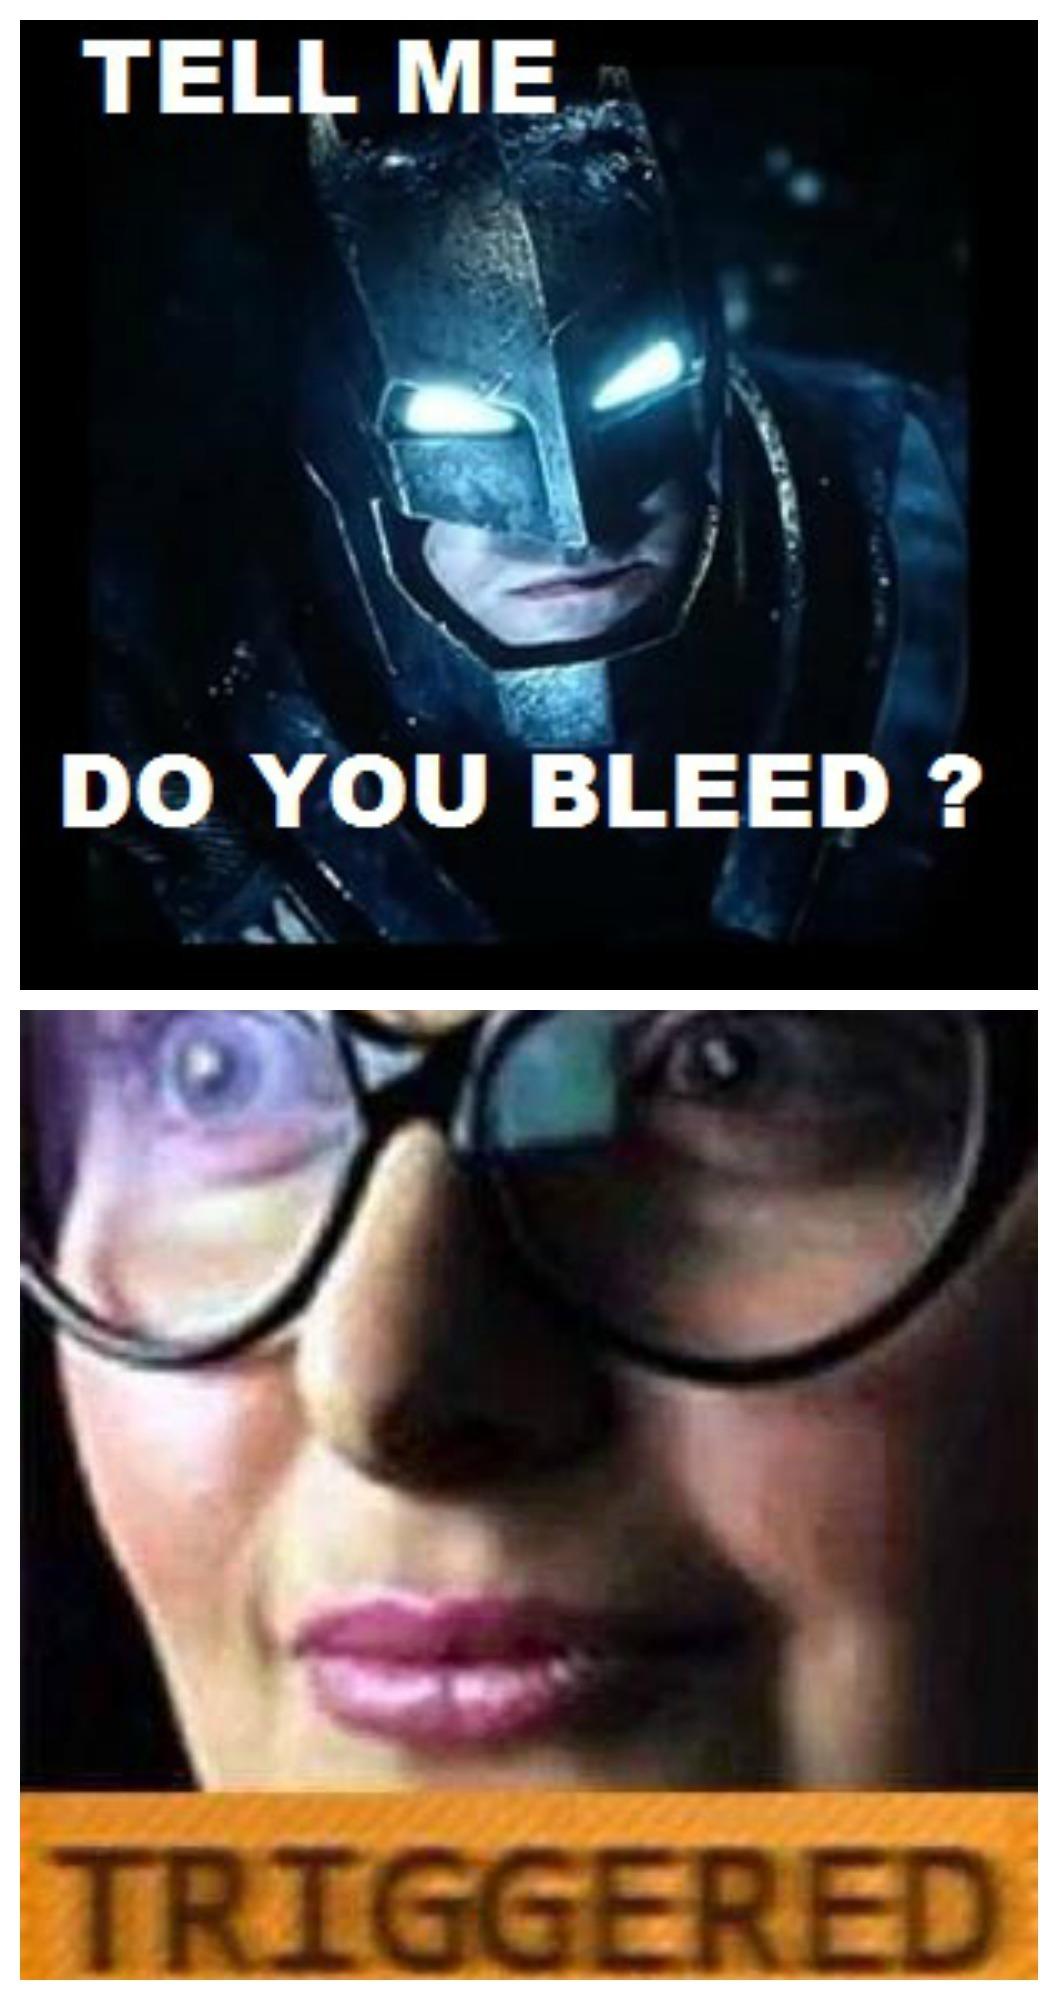 Batman vs feminist - meme